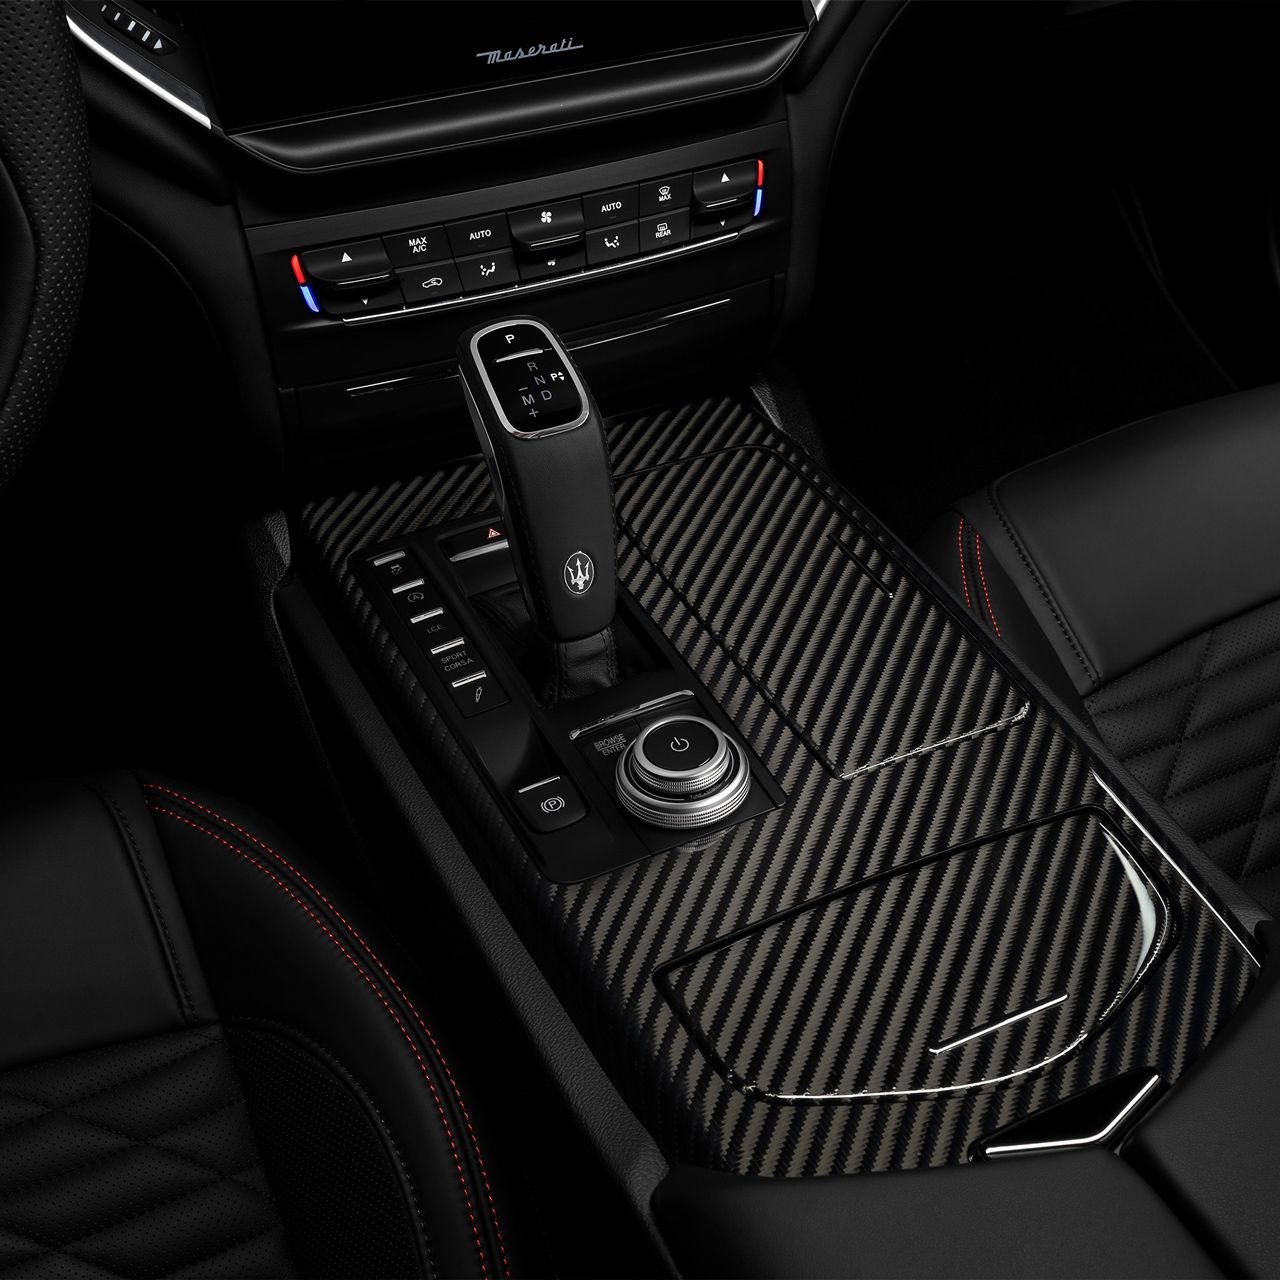 Maserati Ghibli - Interieur - Automatikgetriebe